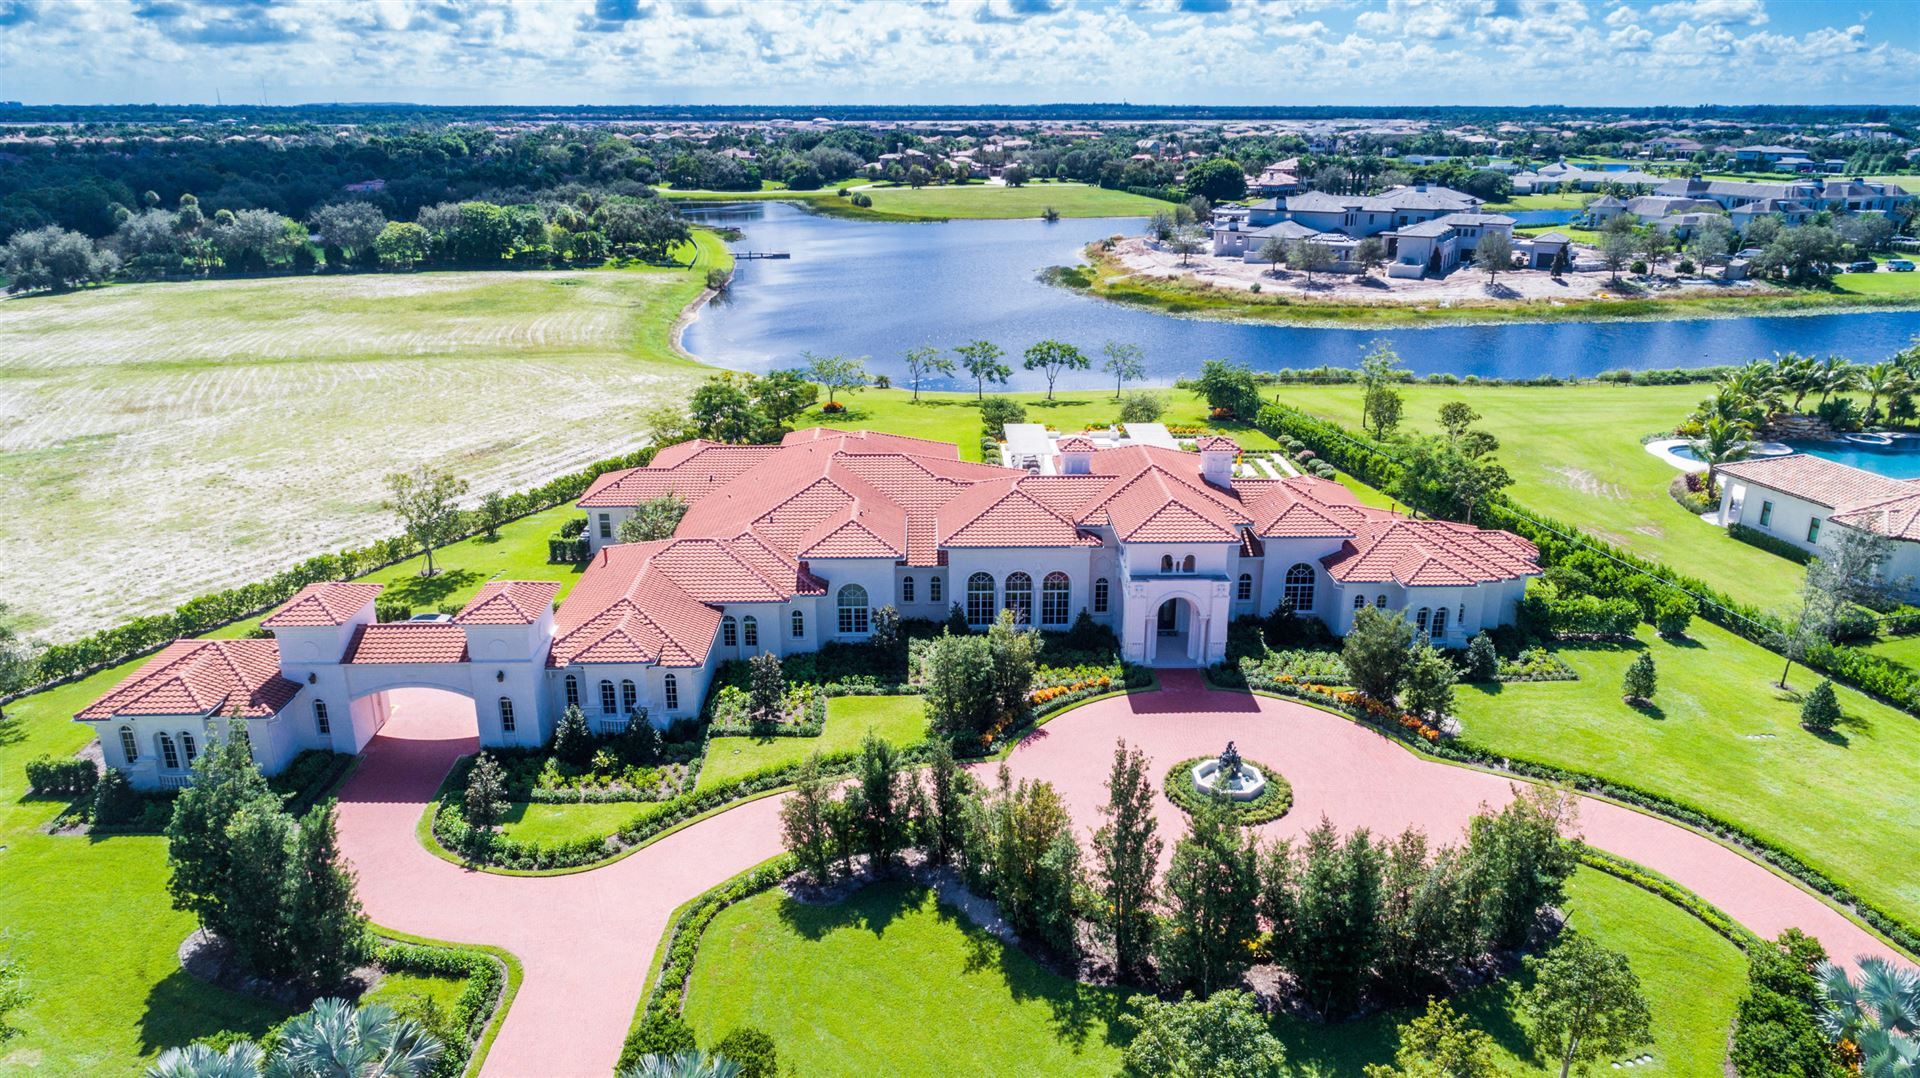 16155 Quiet Vista Circle, Delray Beach, FL 33446 - #: RX-10669885